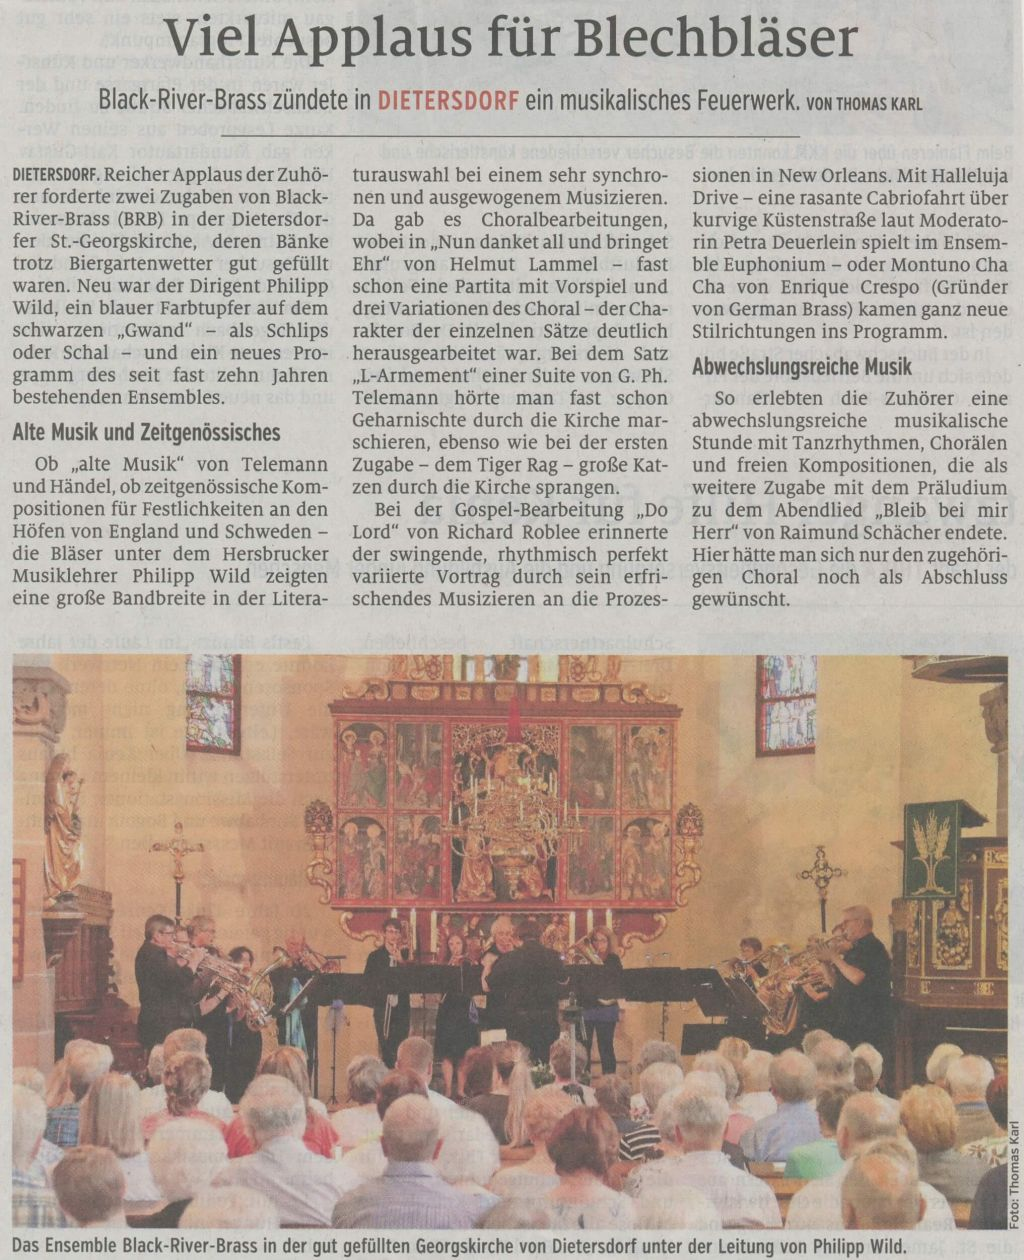 26.06.2019 Viel Applaus für Blechbläser - Schwabacher Tagblatt